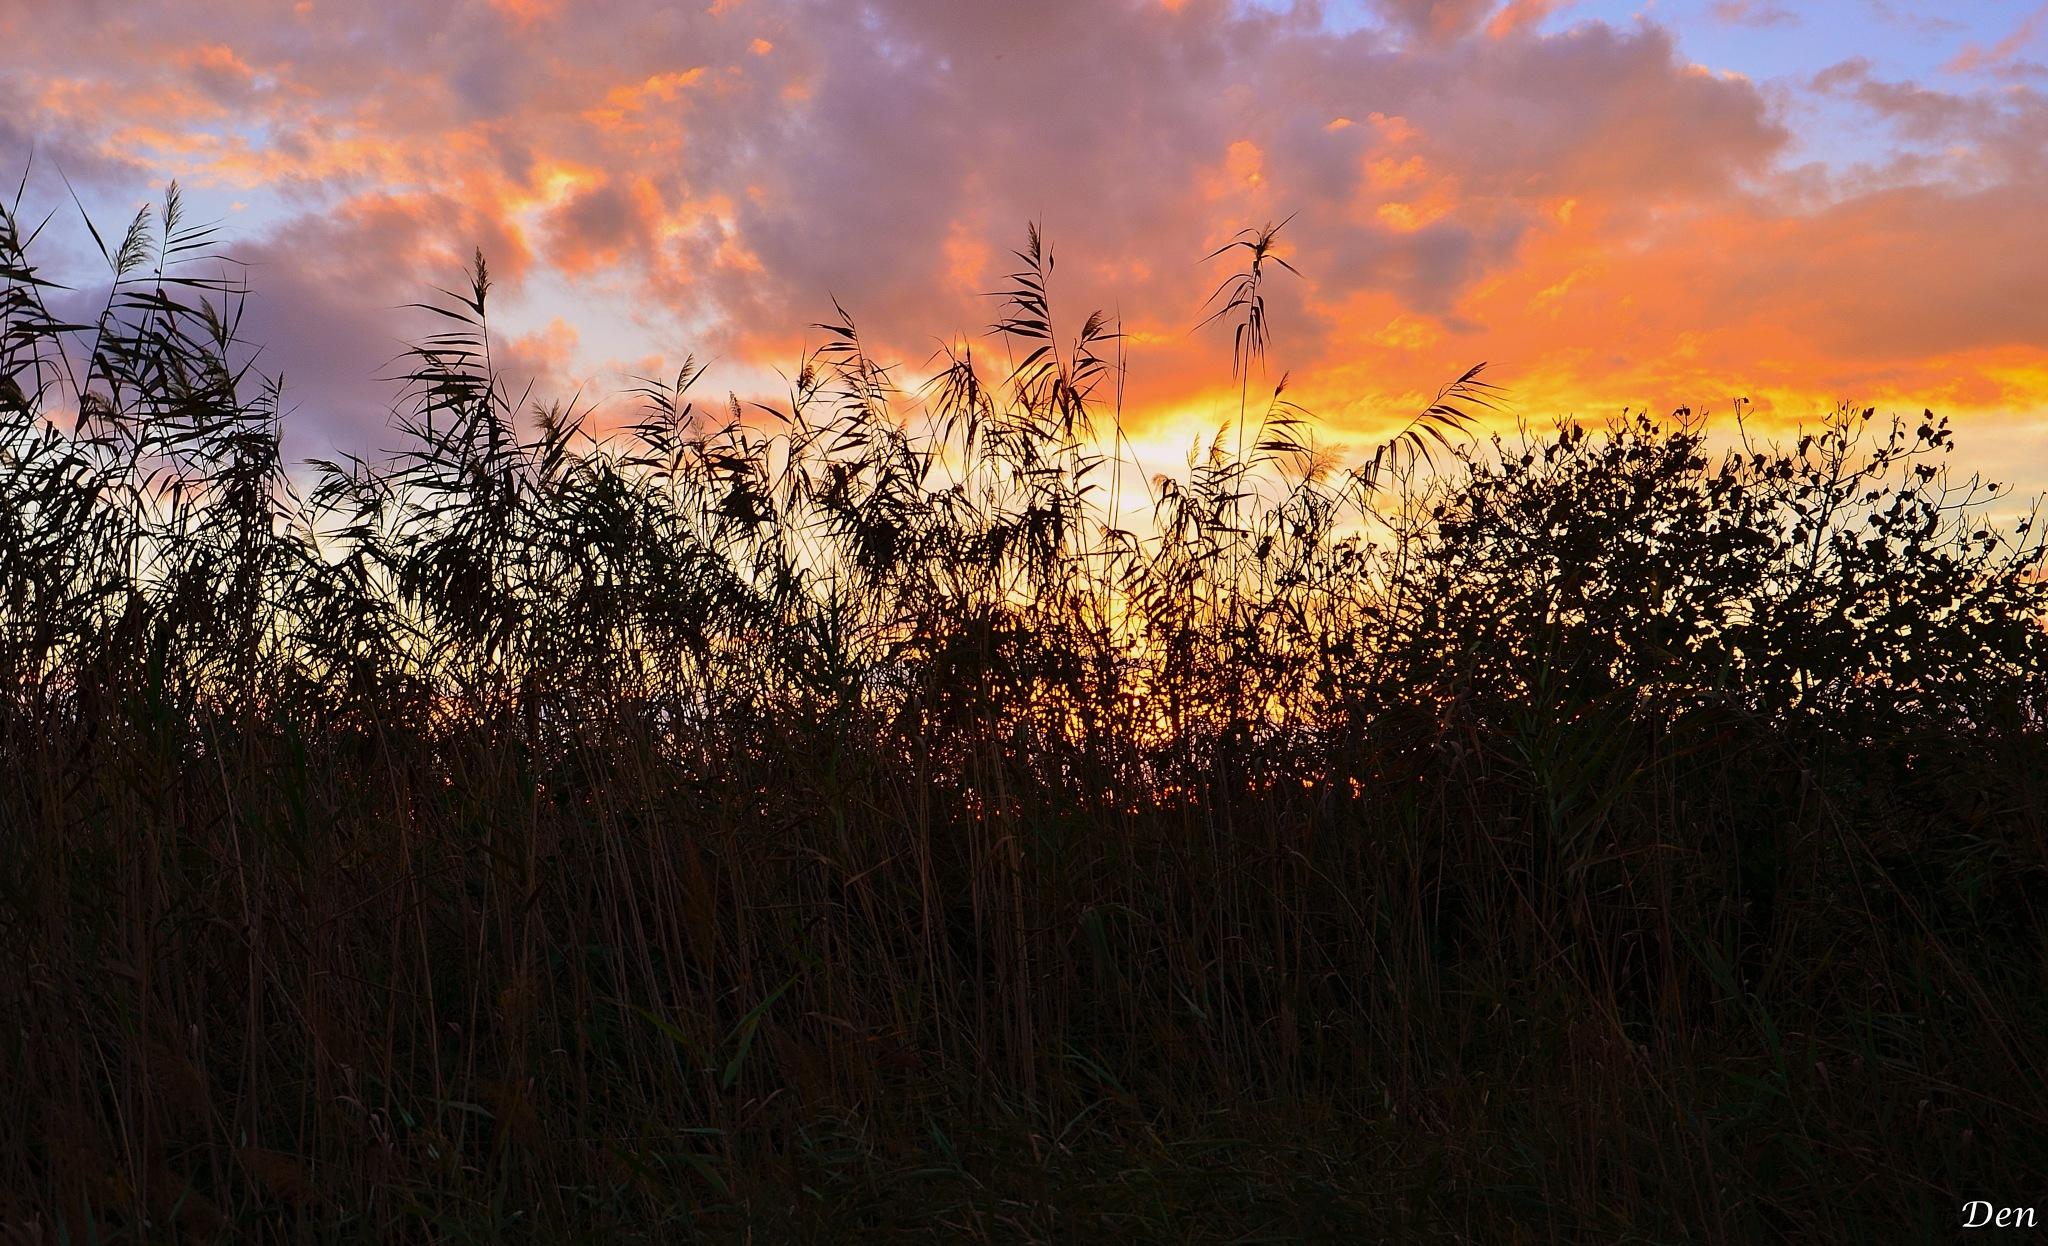 Menorca Sunsetting by Denis_Bond